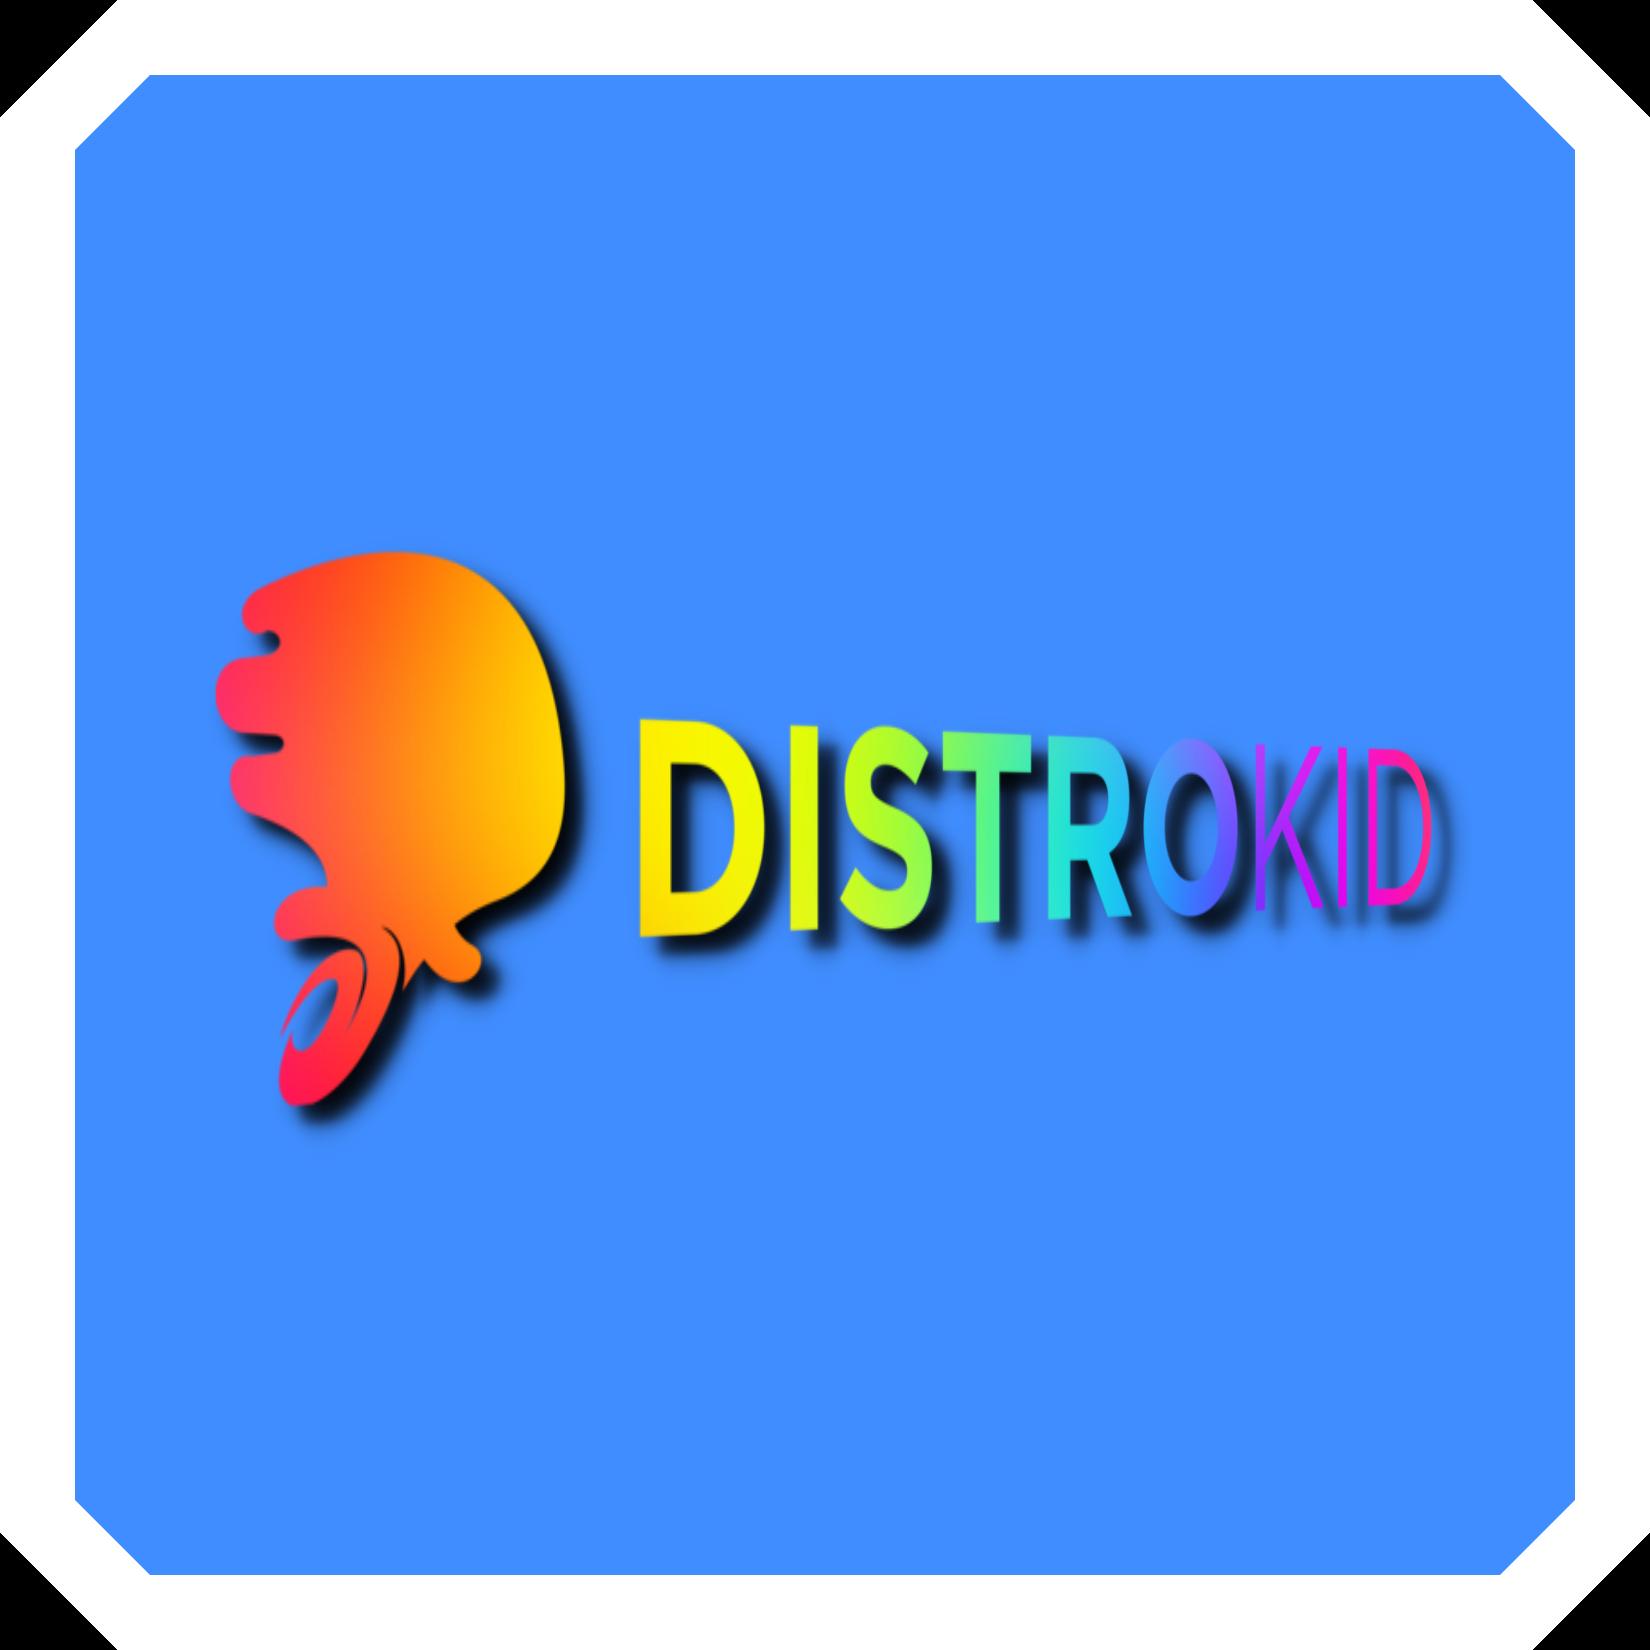 distrokid 2.png